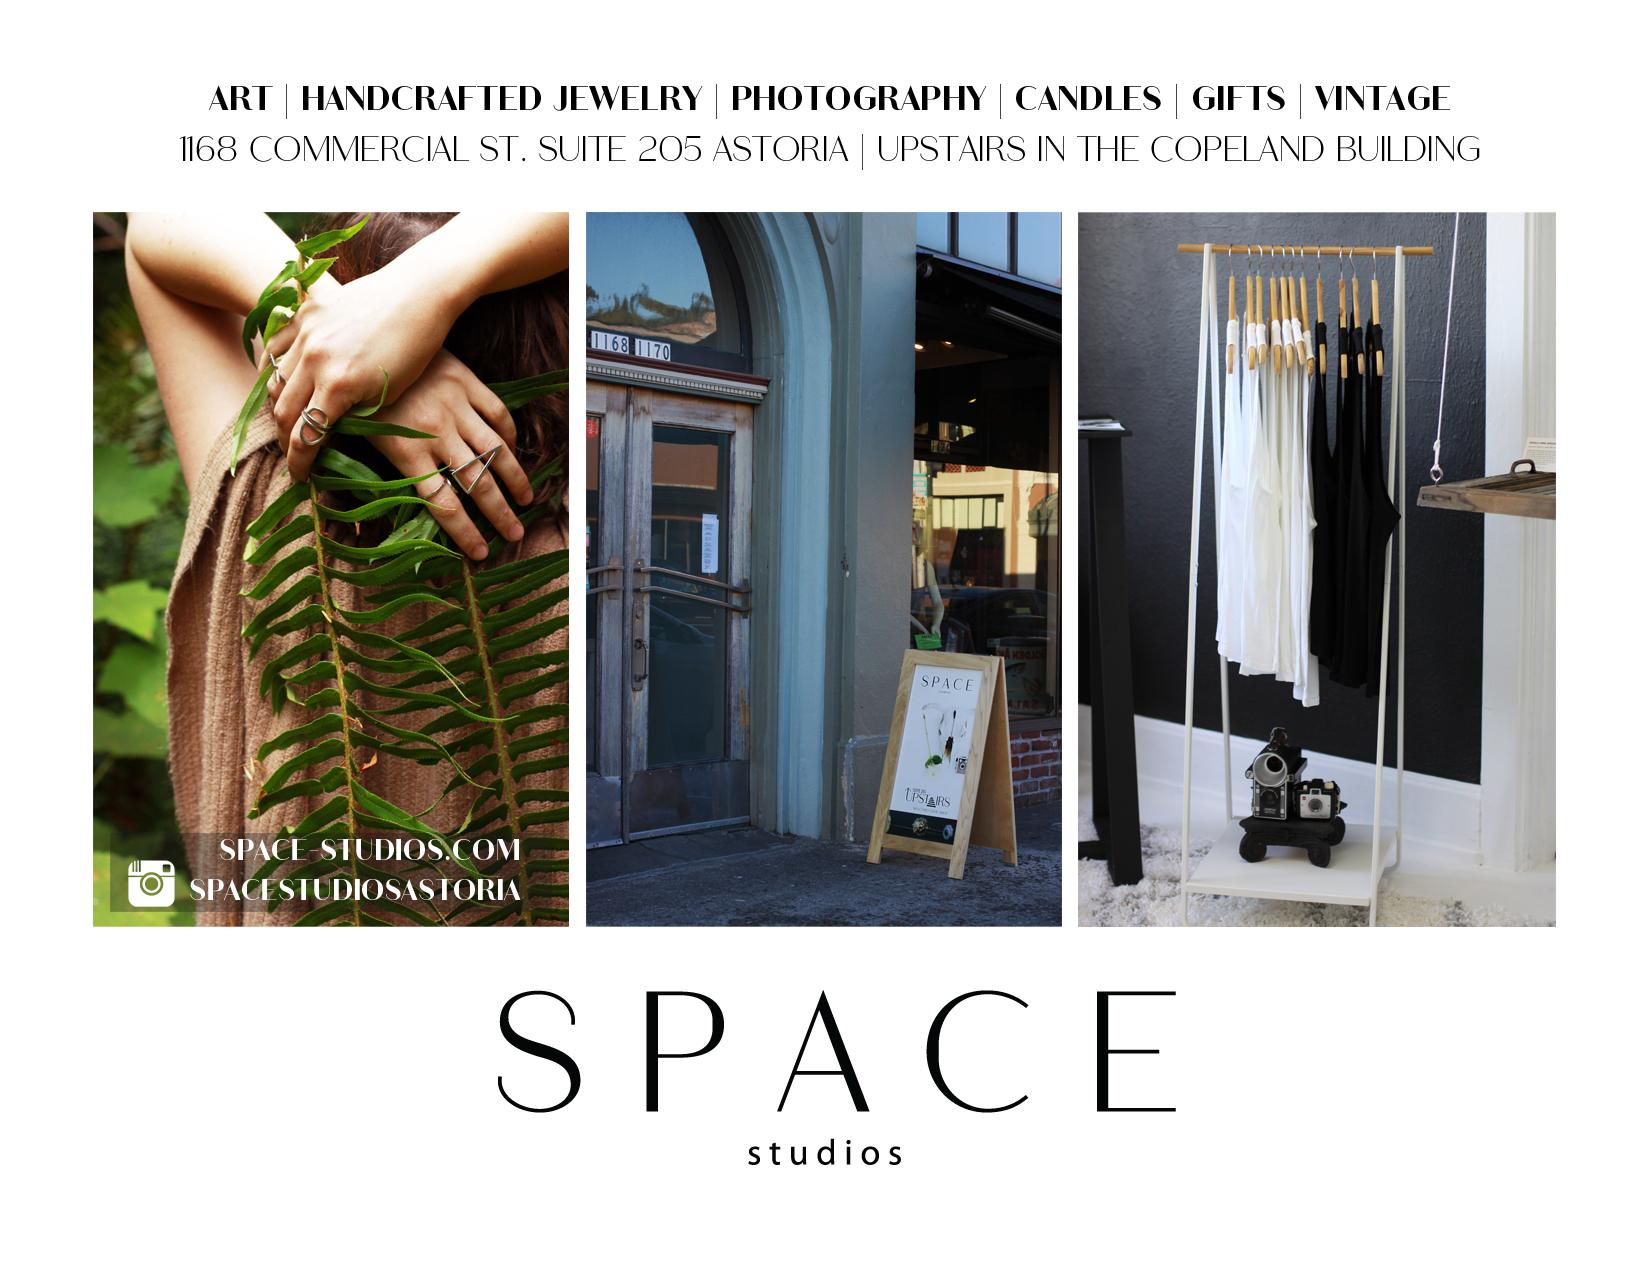 Space Studios, Denise Faddis